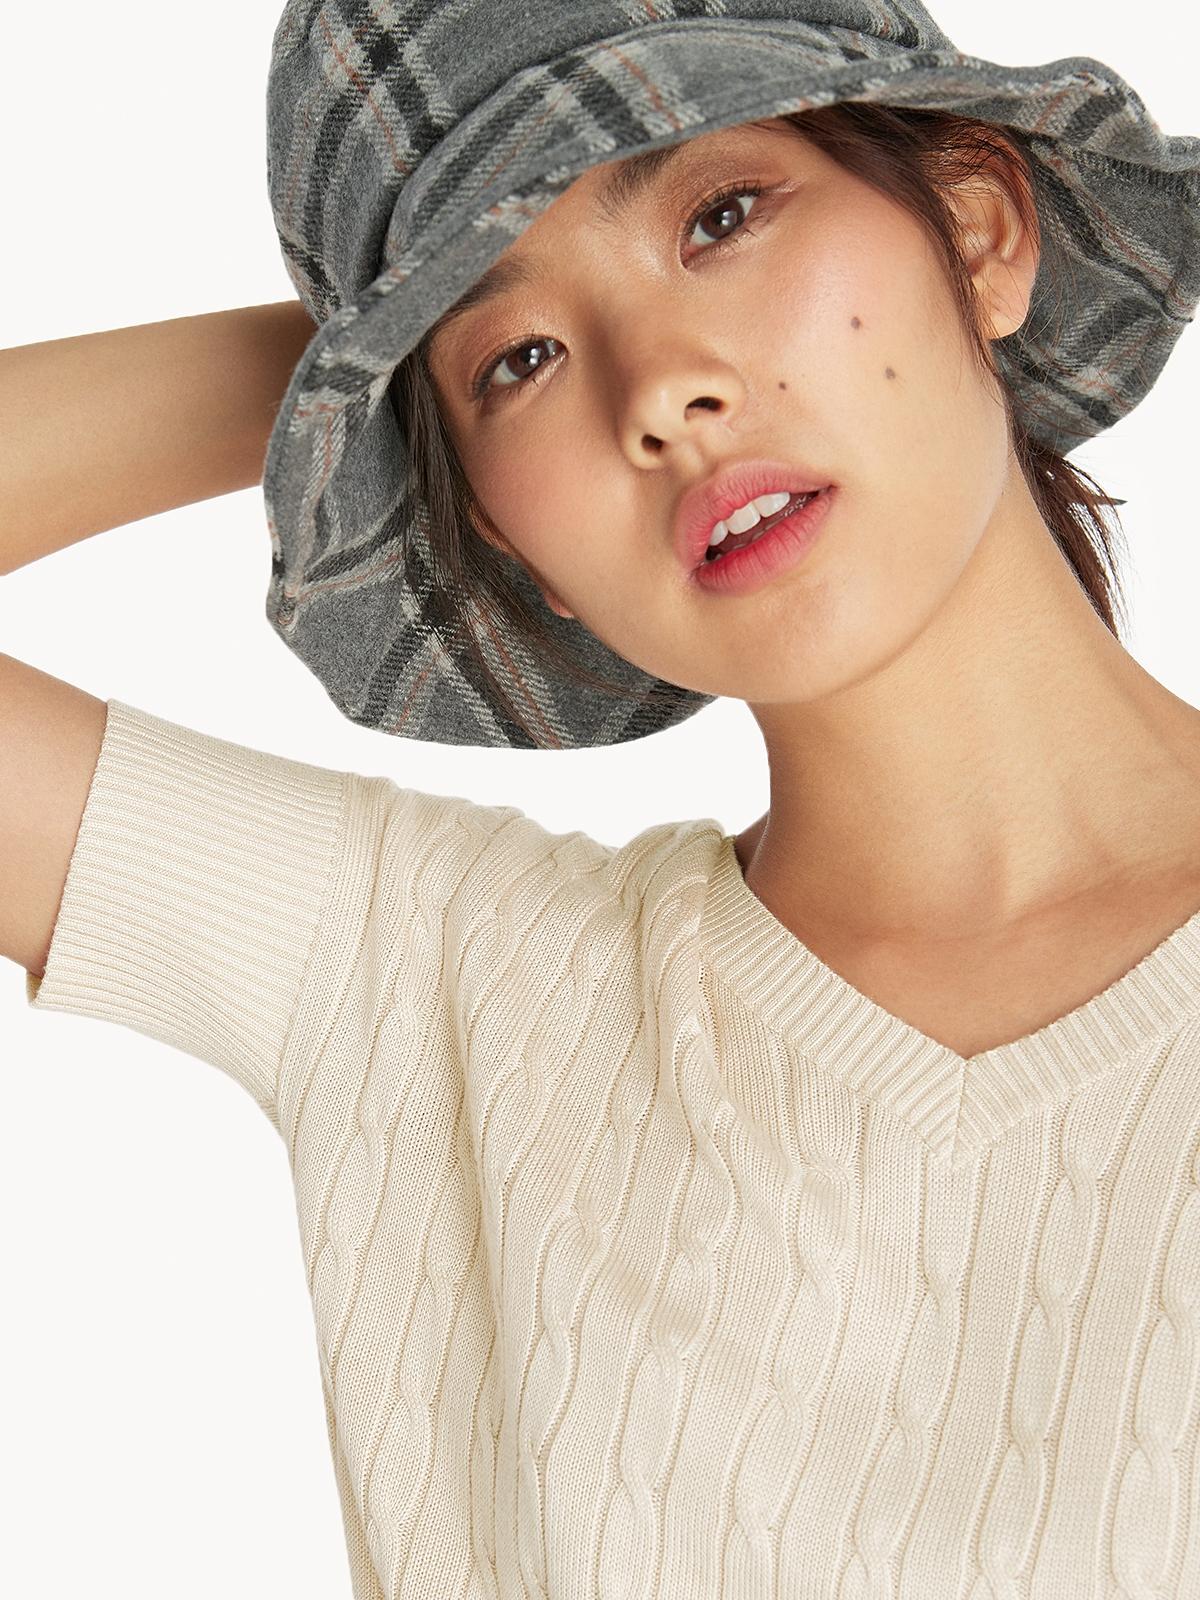 45972f7bcb195 Women s POMELO FASHION Hats